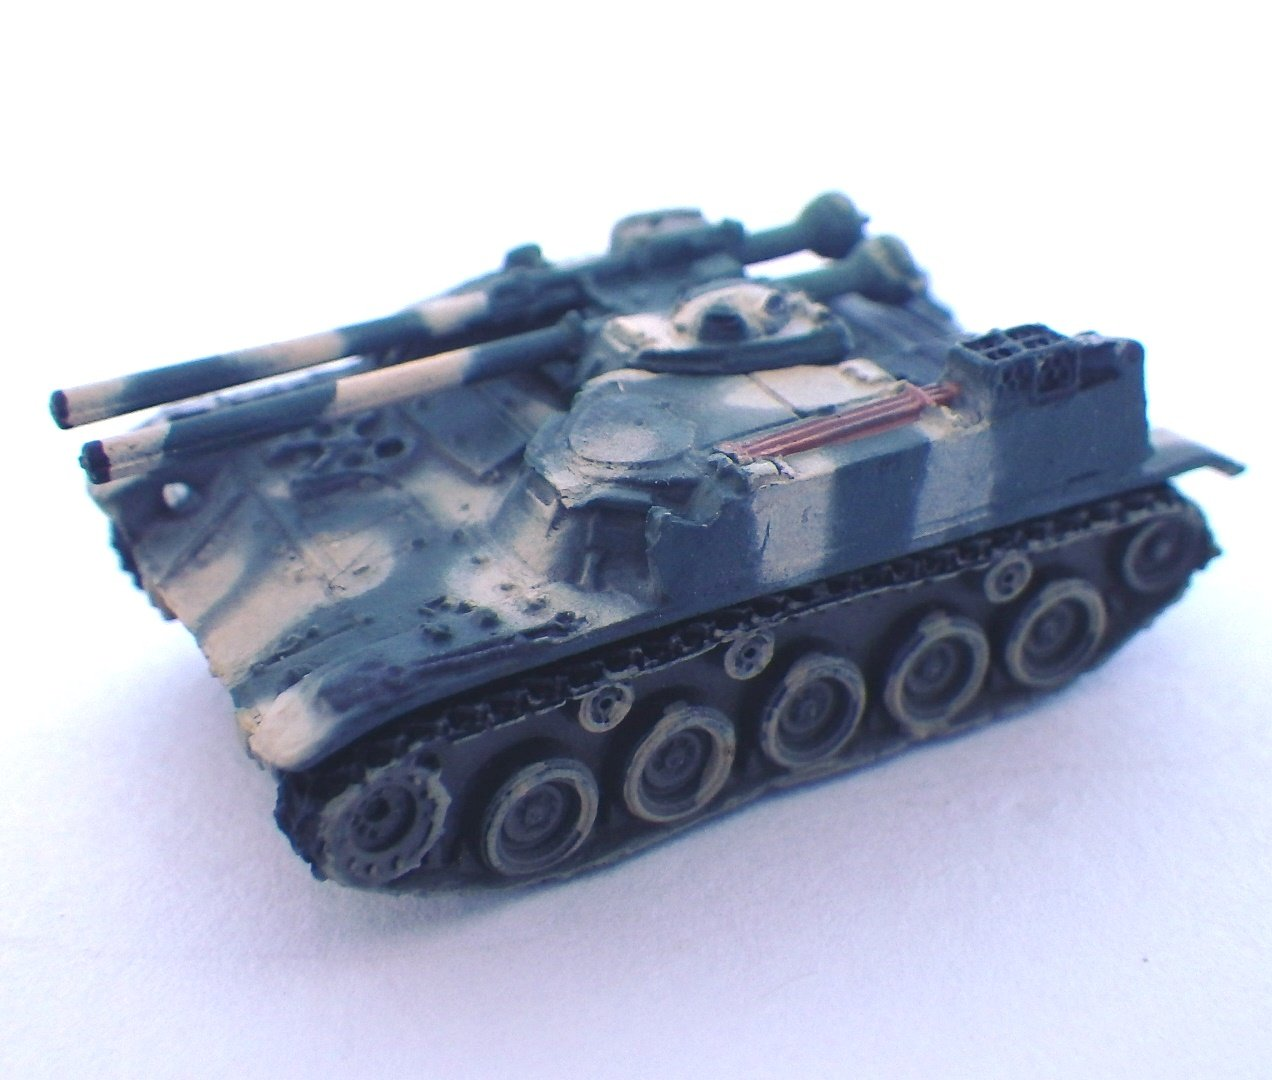 1/144 Welt Tank Museum Series 04-66 [Boden Self-Defense Force] 60 Formula selbstfahr 106mm recoilless Gewehr Tropfen Tarnung einen Artikel